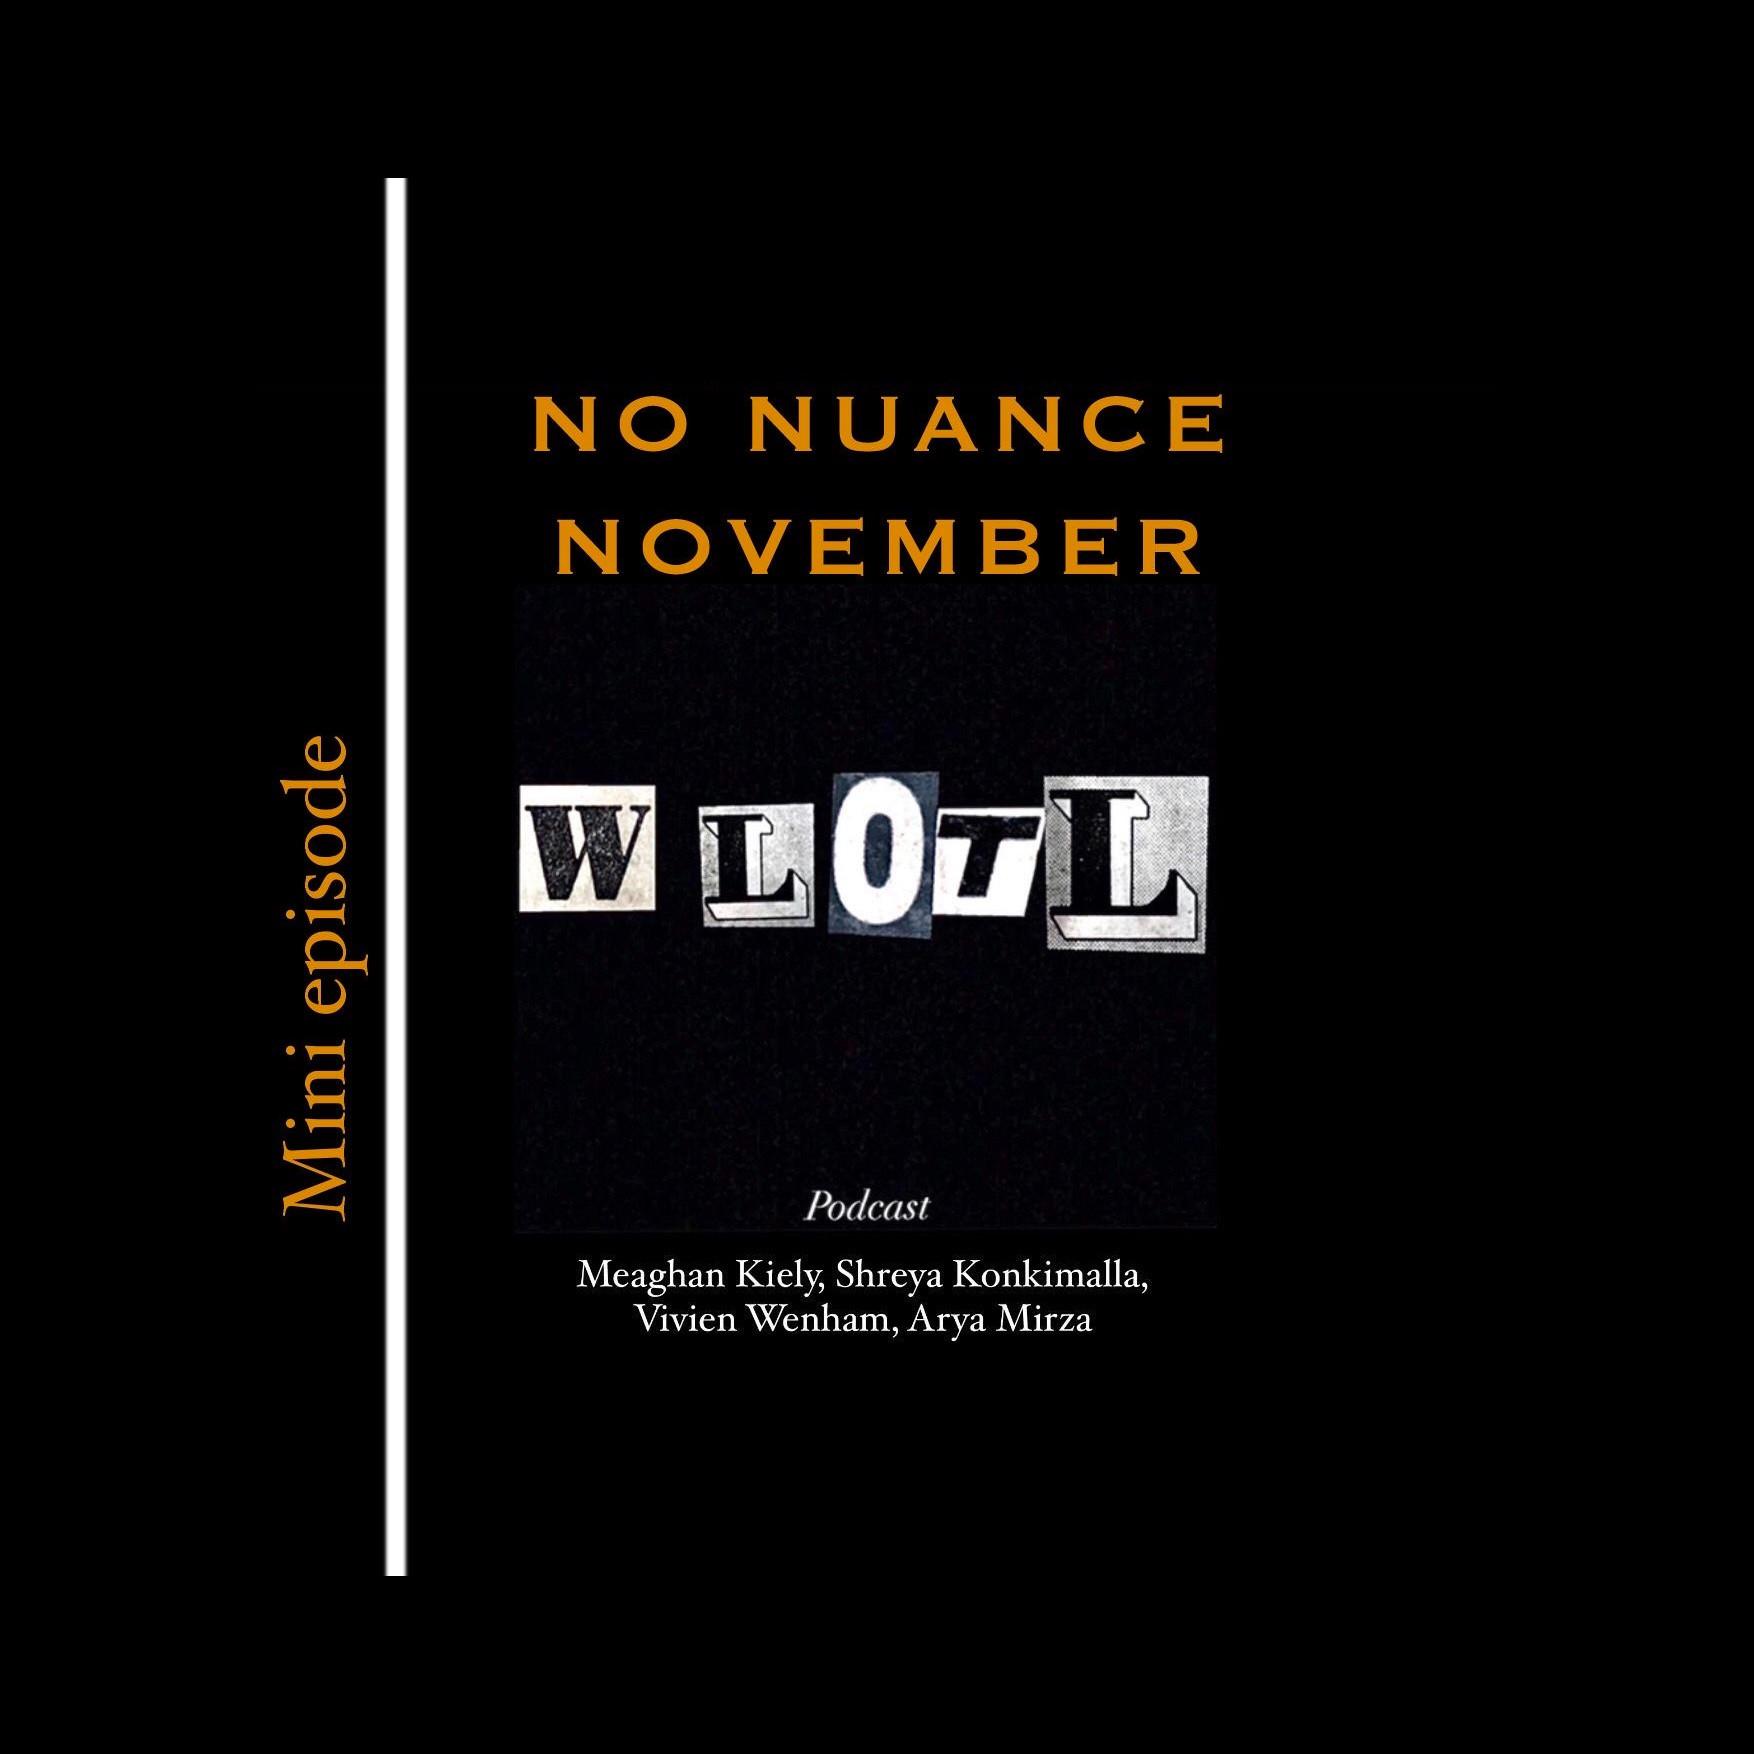 EP 10: No Nuance November (Mini Episode)